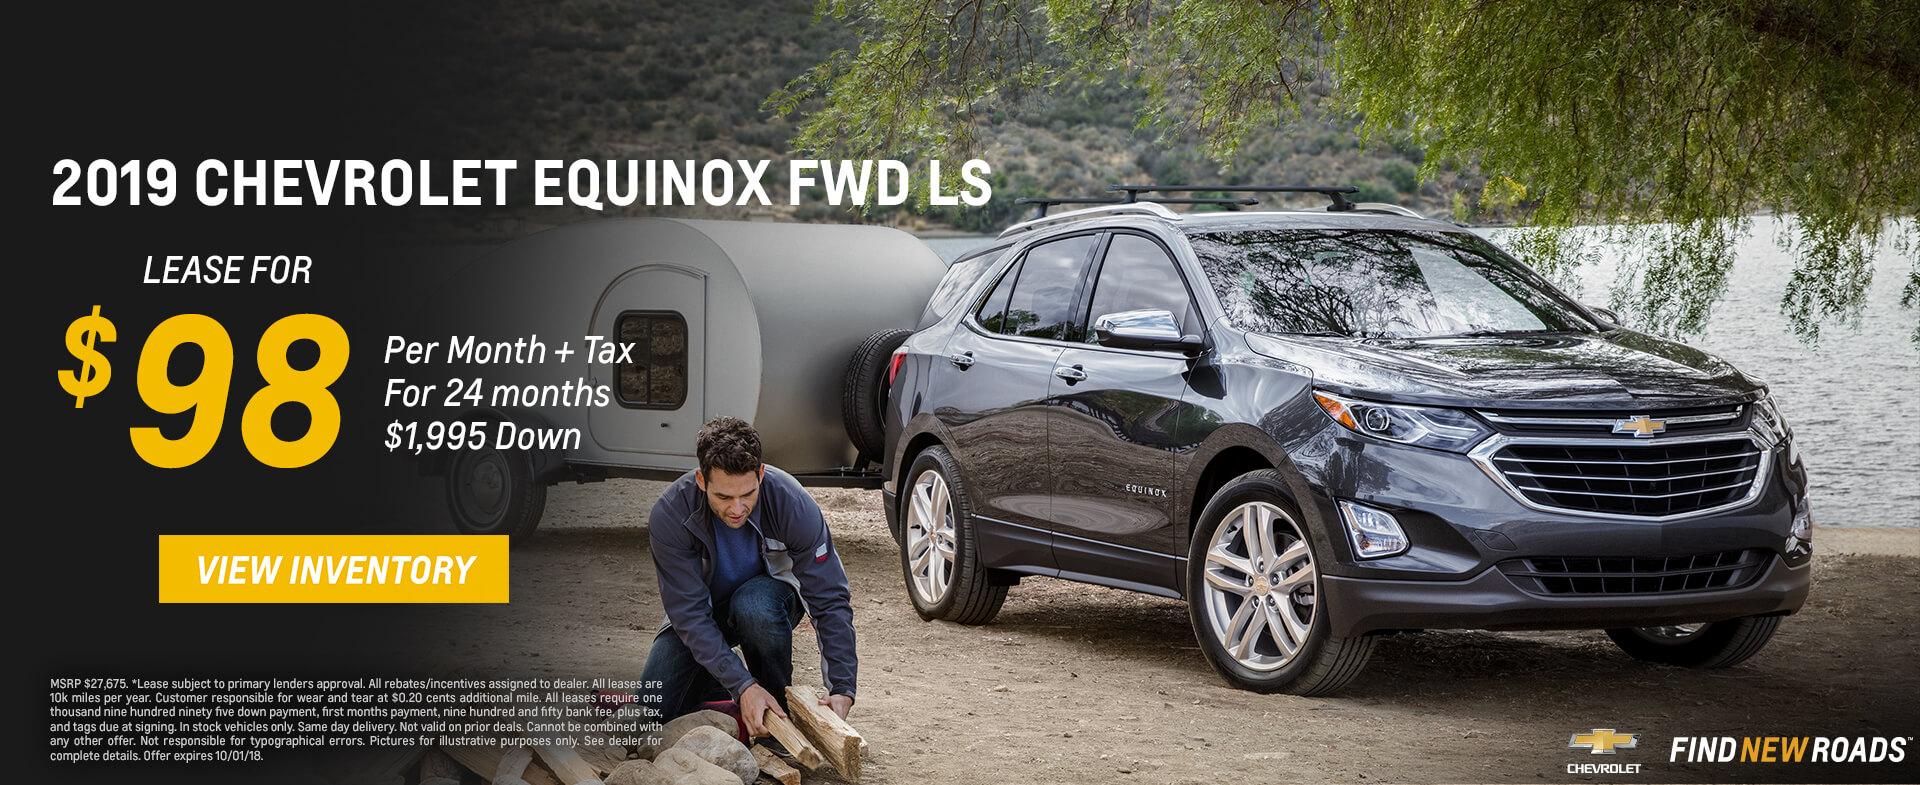 Chevrolet Equinox $98 Lease